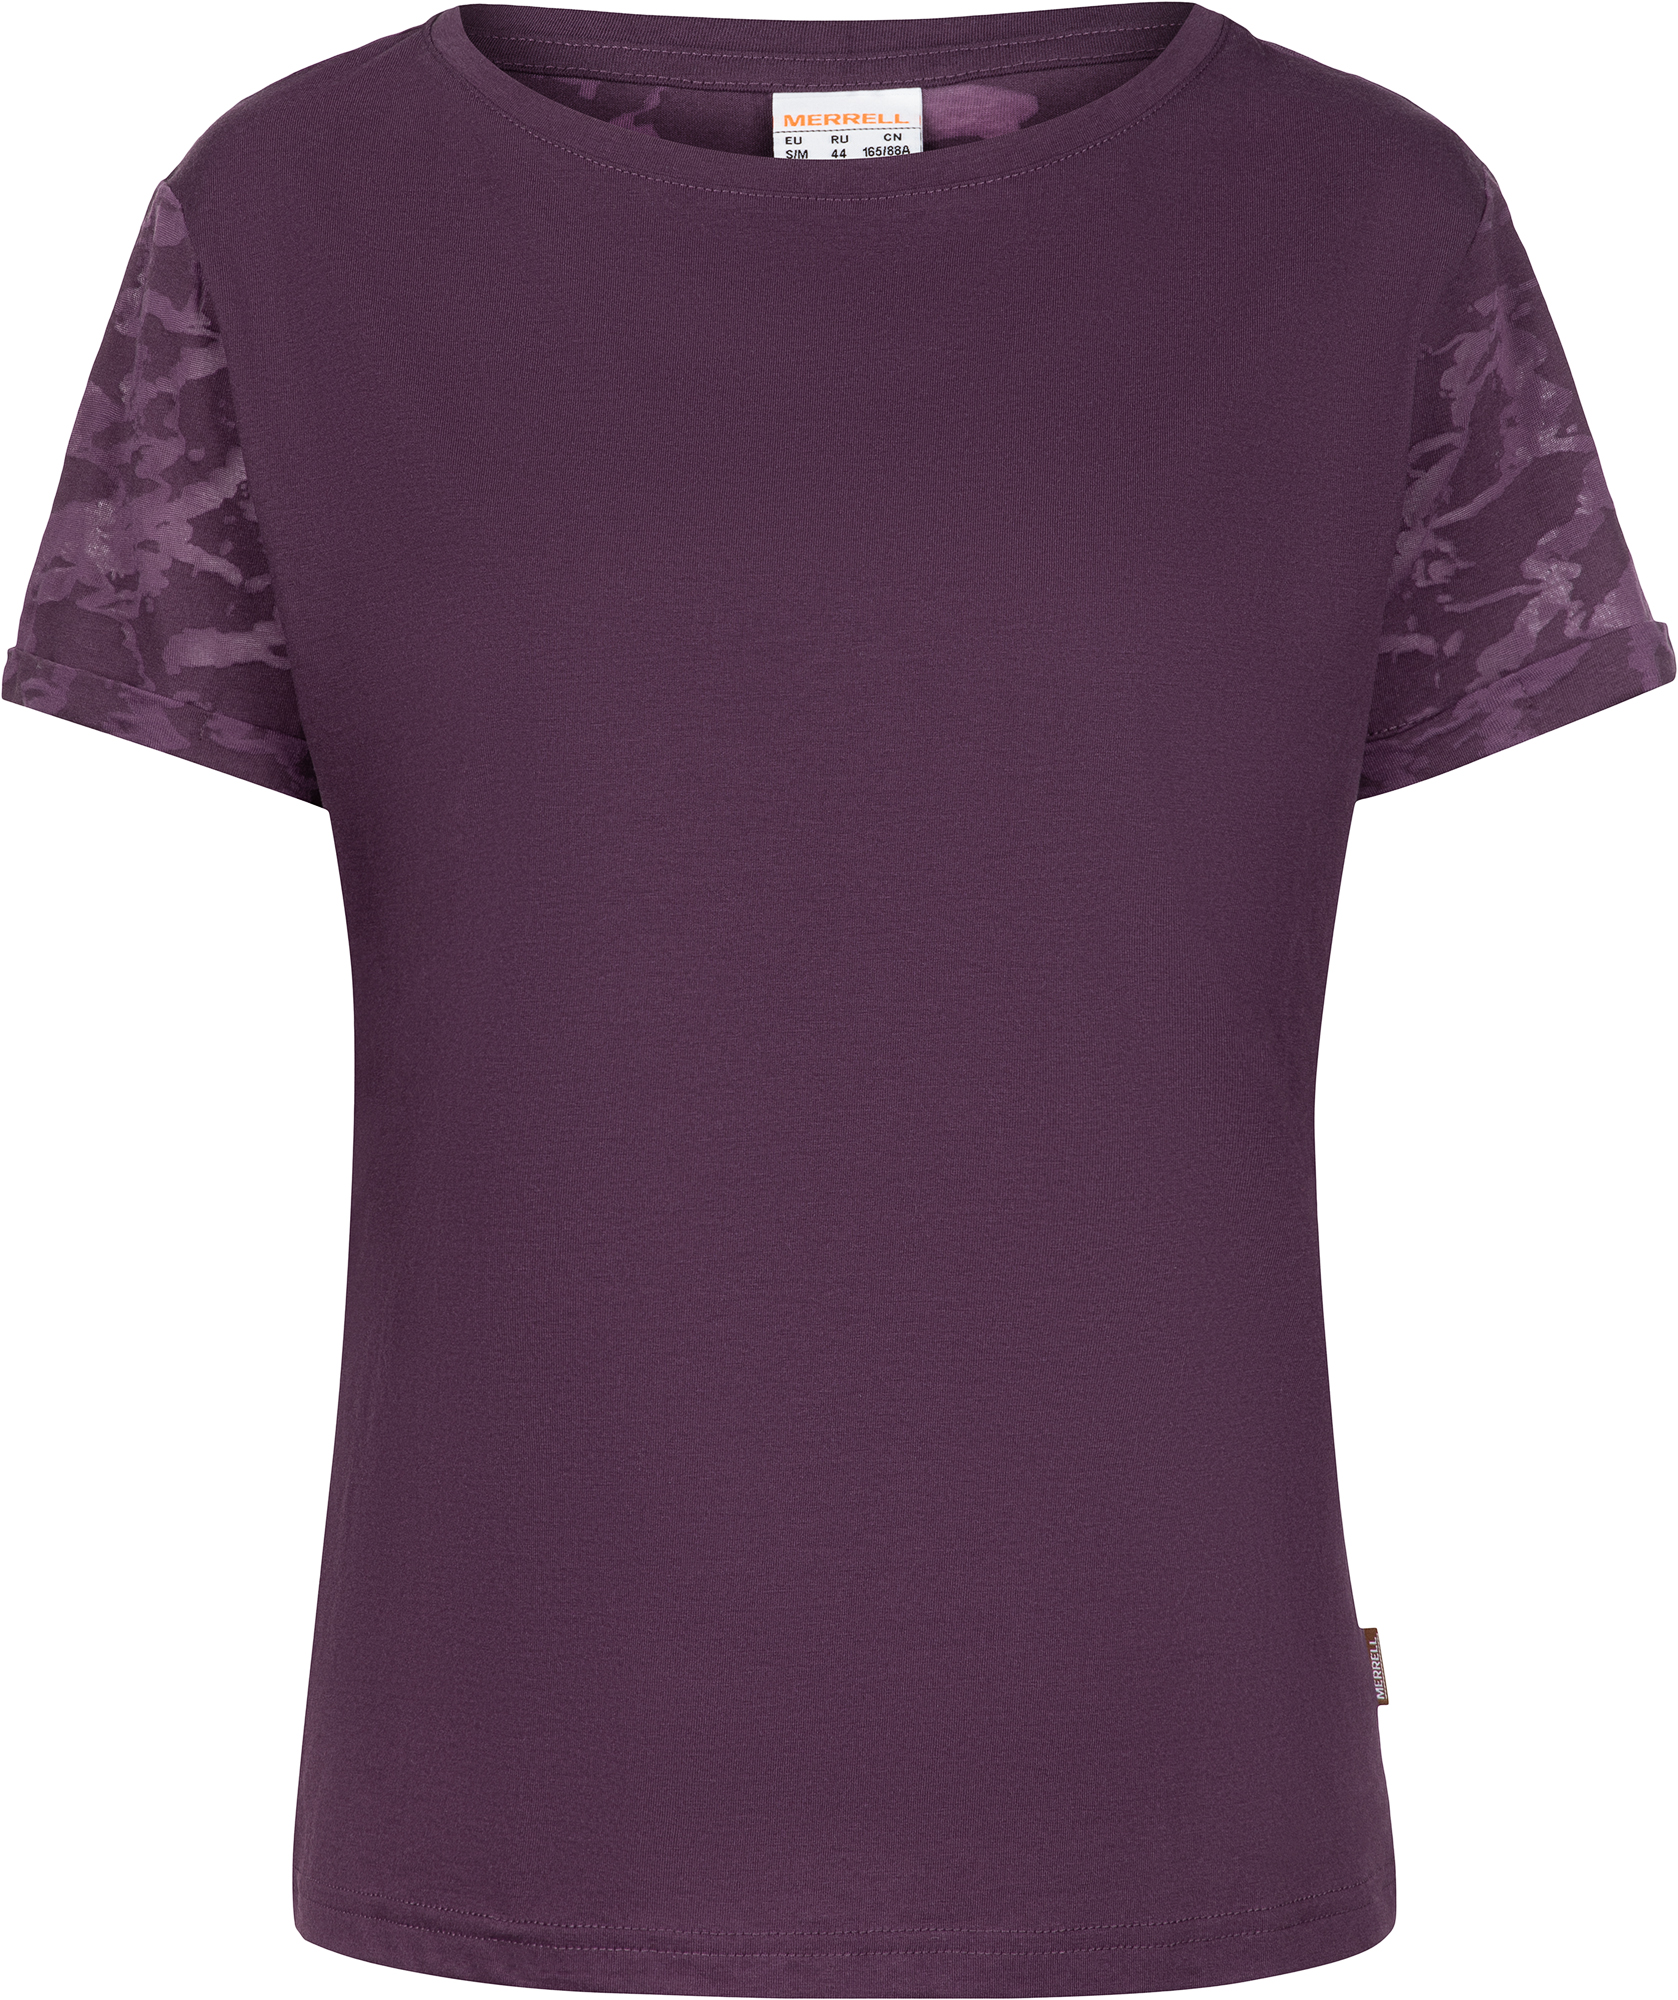 Merrell Футболка женская Merrell, размер 52 xtep женская тонкая воздухопроницаемая спортивная футболка